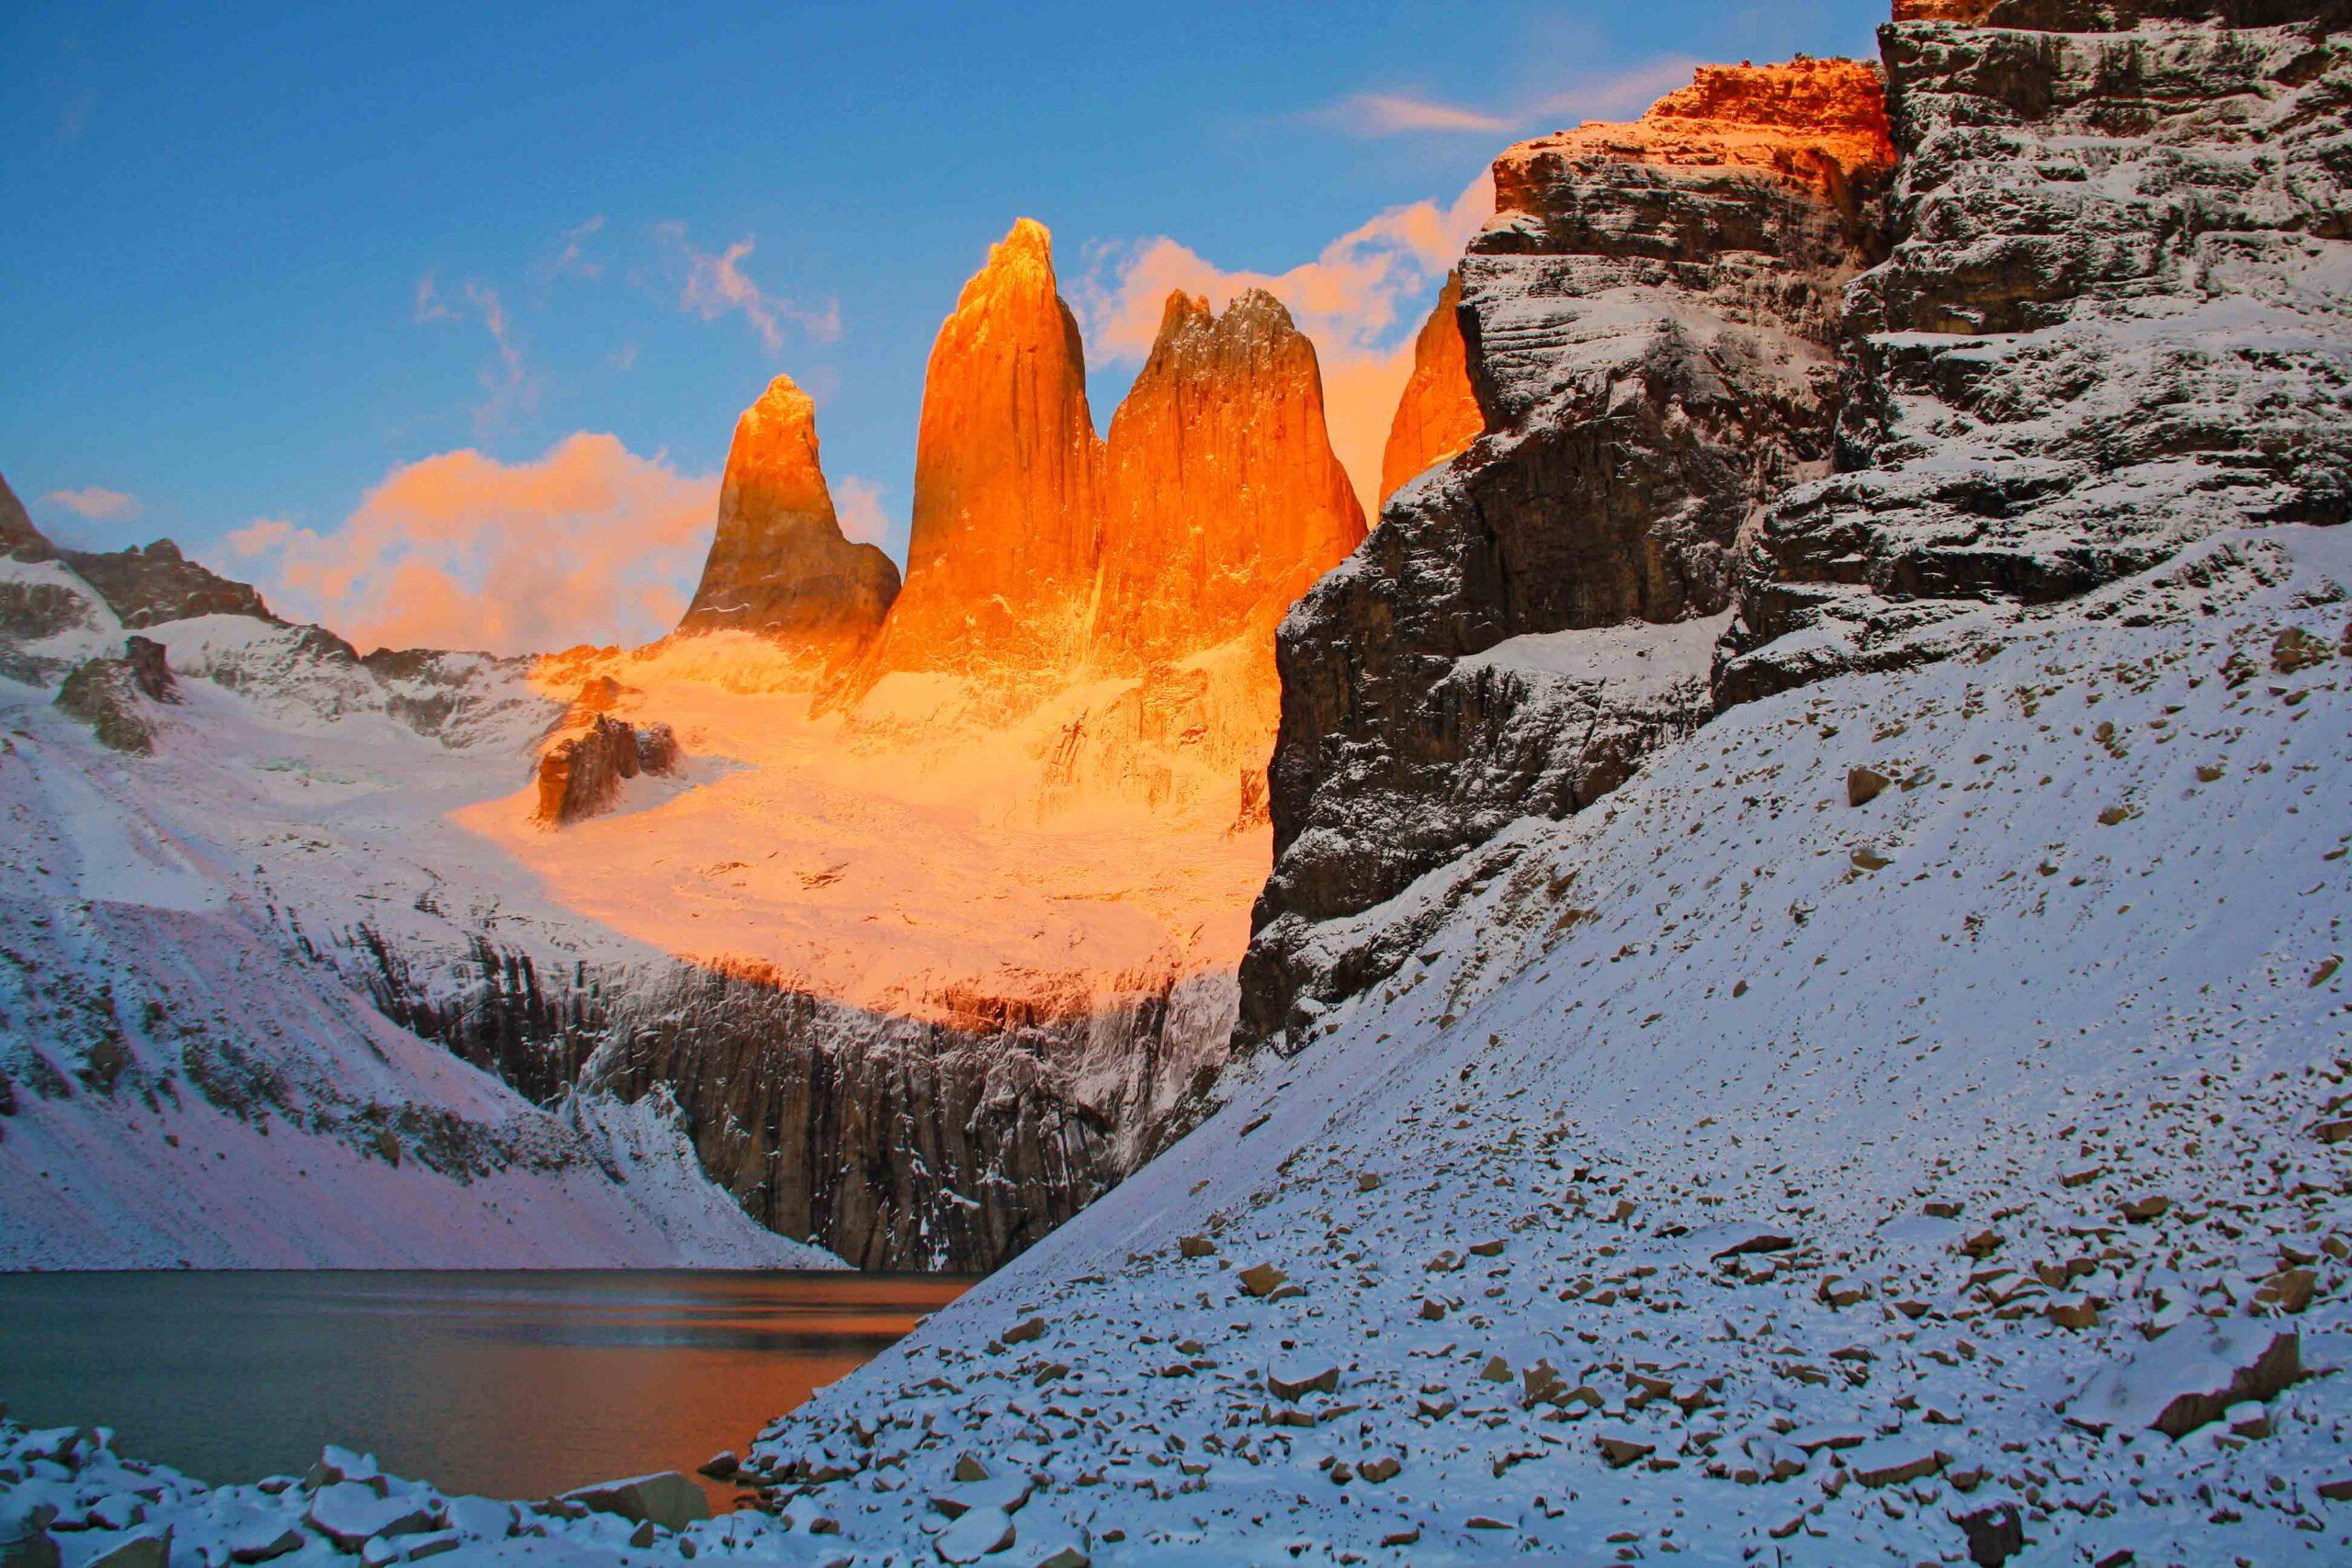 sunrise torres del paine national park chile